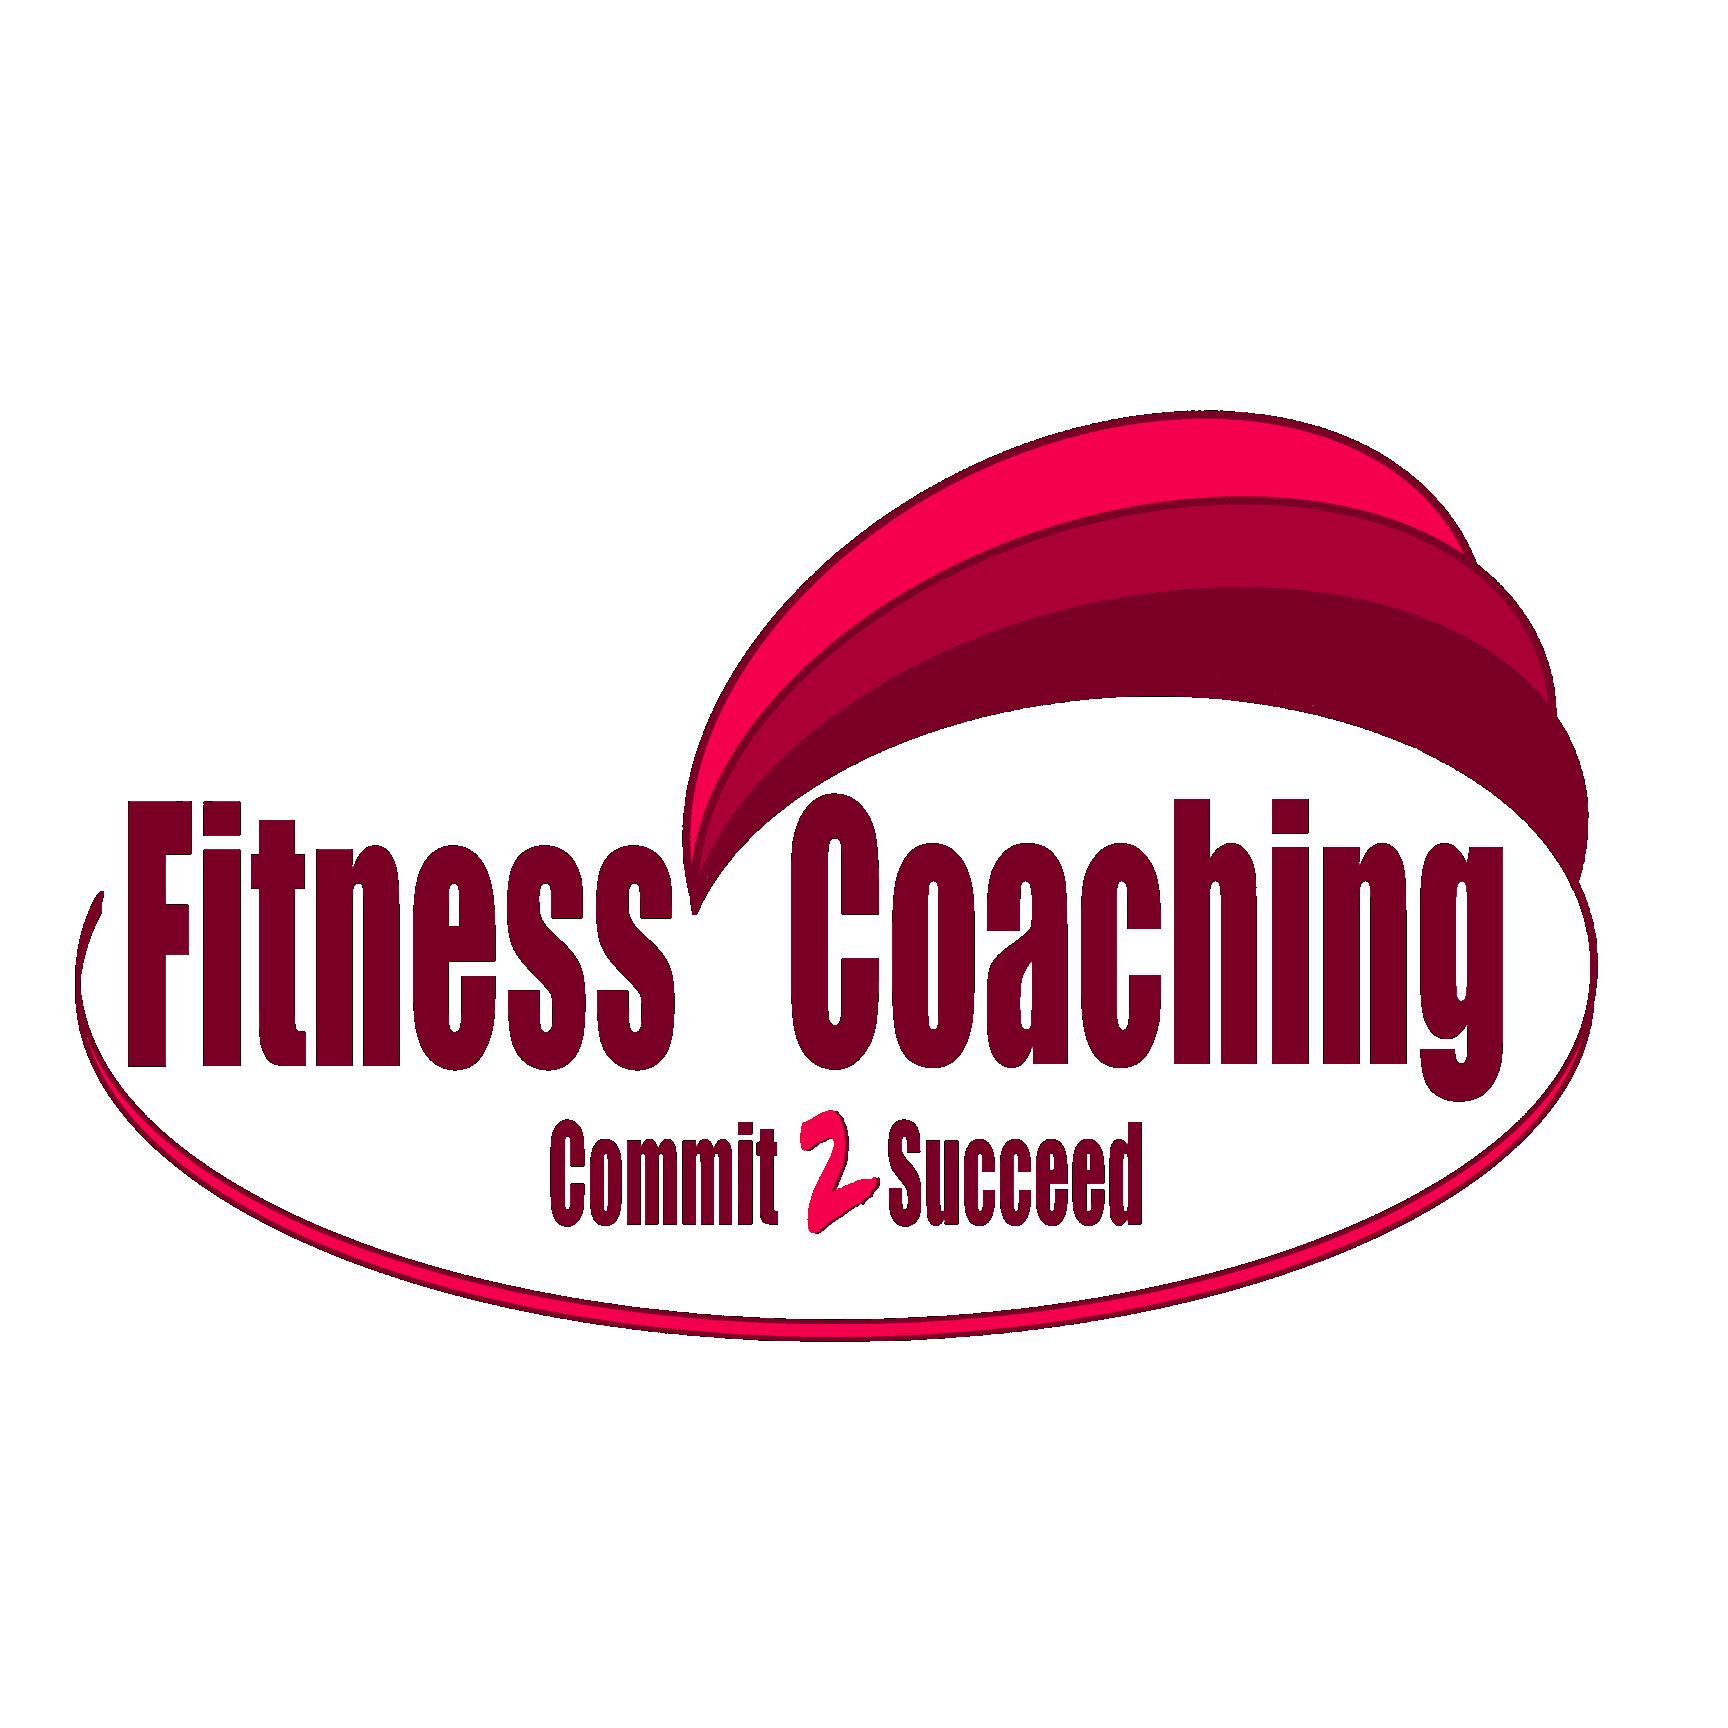 Fitness Coaching LLC